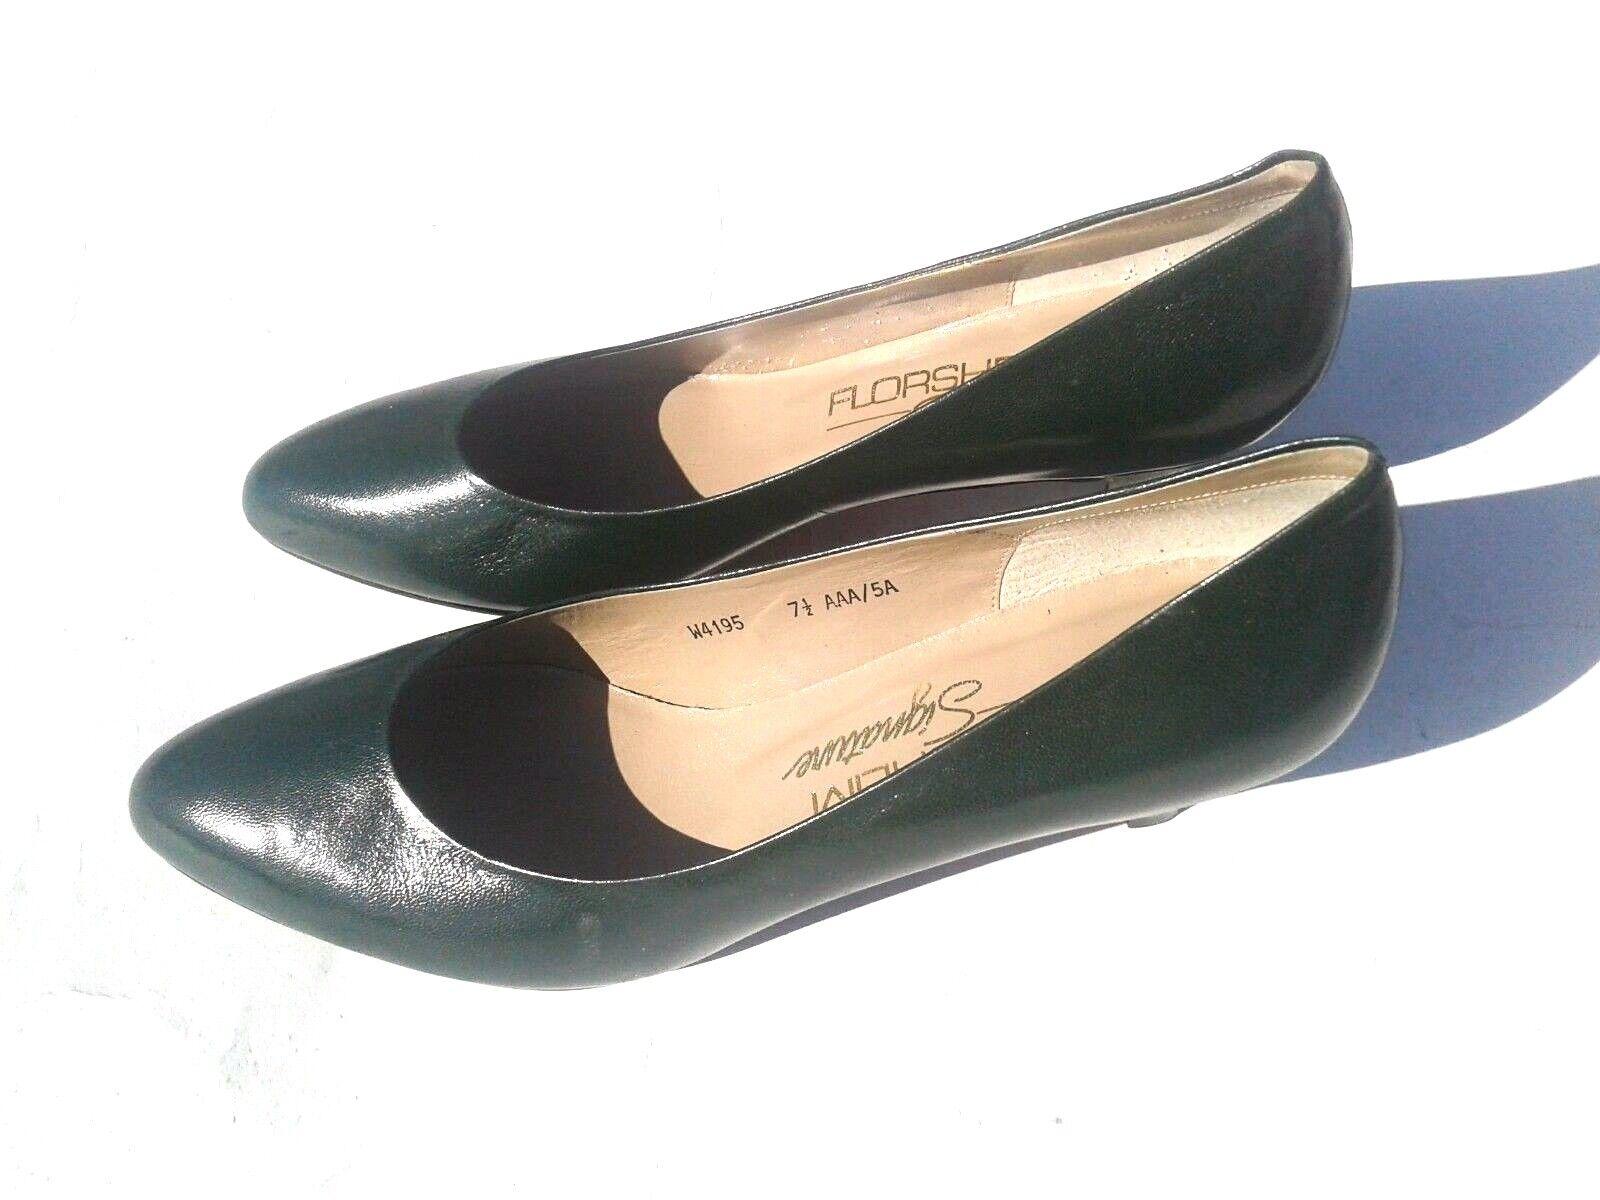 FLORSHEIM Signature Grün Leather Upper Heel Pumps Größe 7.5AAA - NWOB